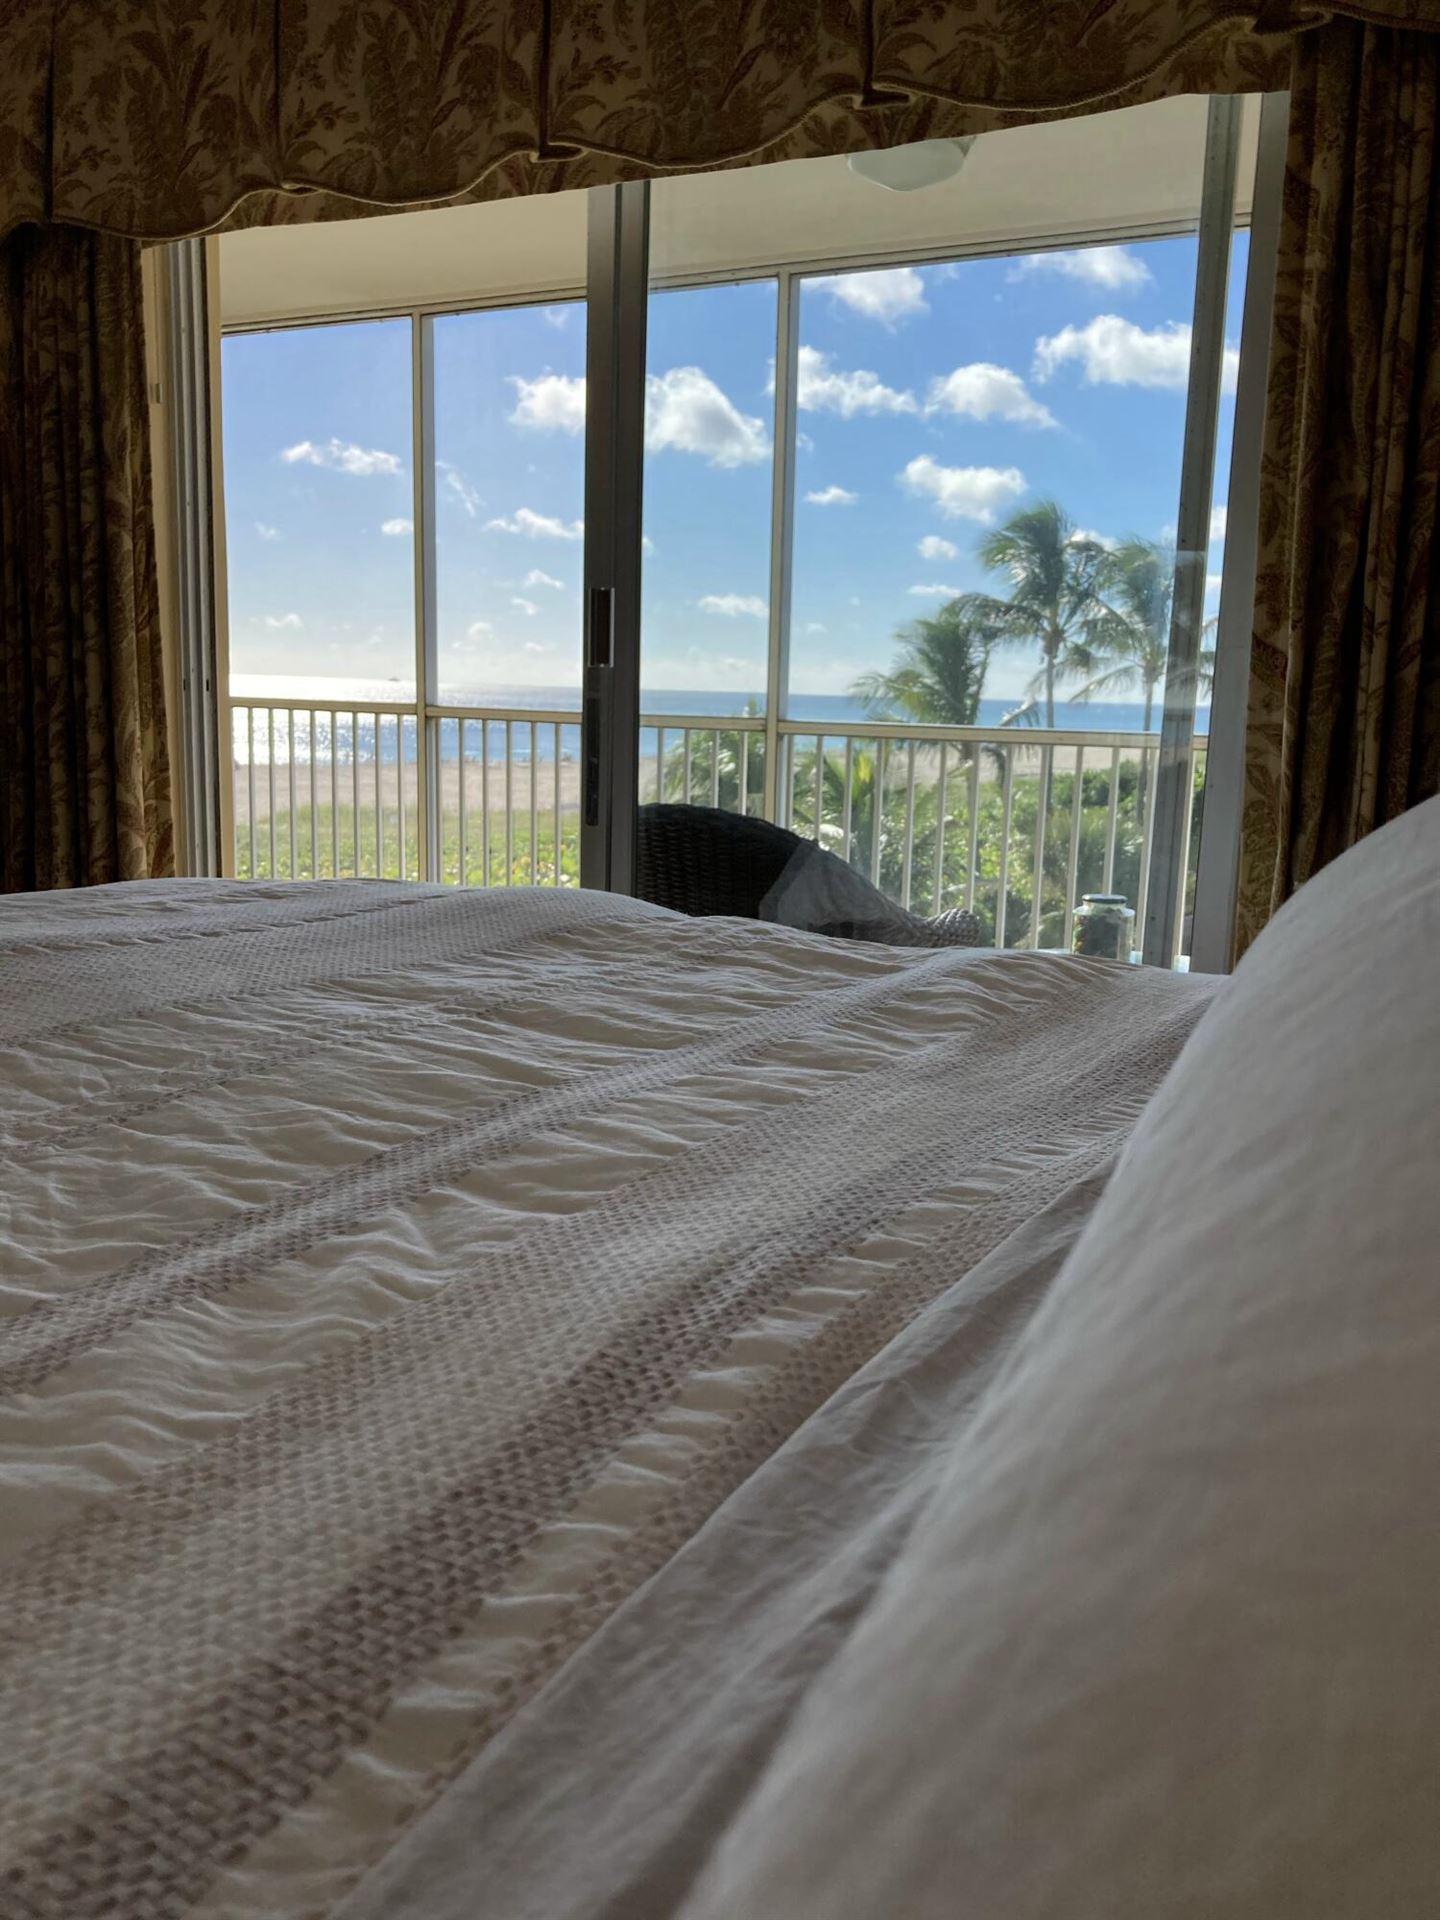 3600 N Ocean 425 Drive #425, Riviera Beach, FL 33404 - MLS#: RX-10742593